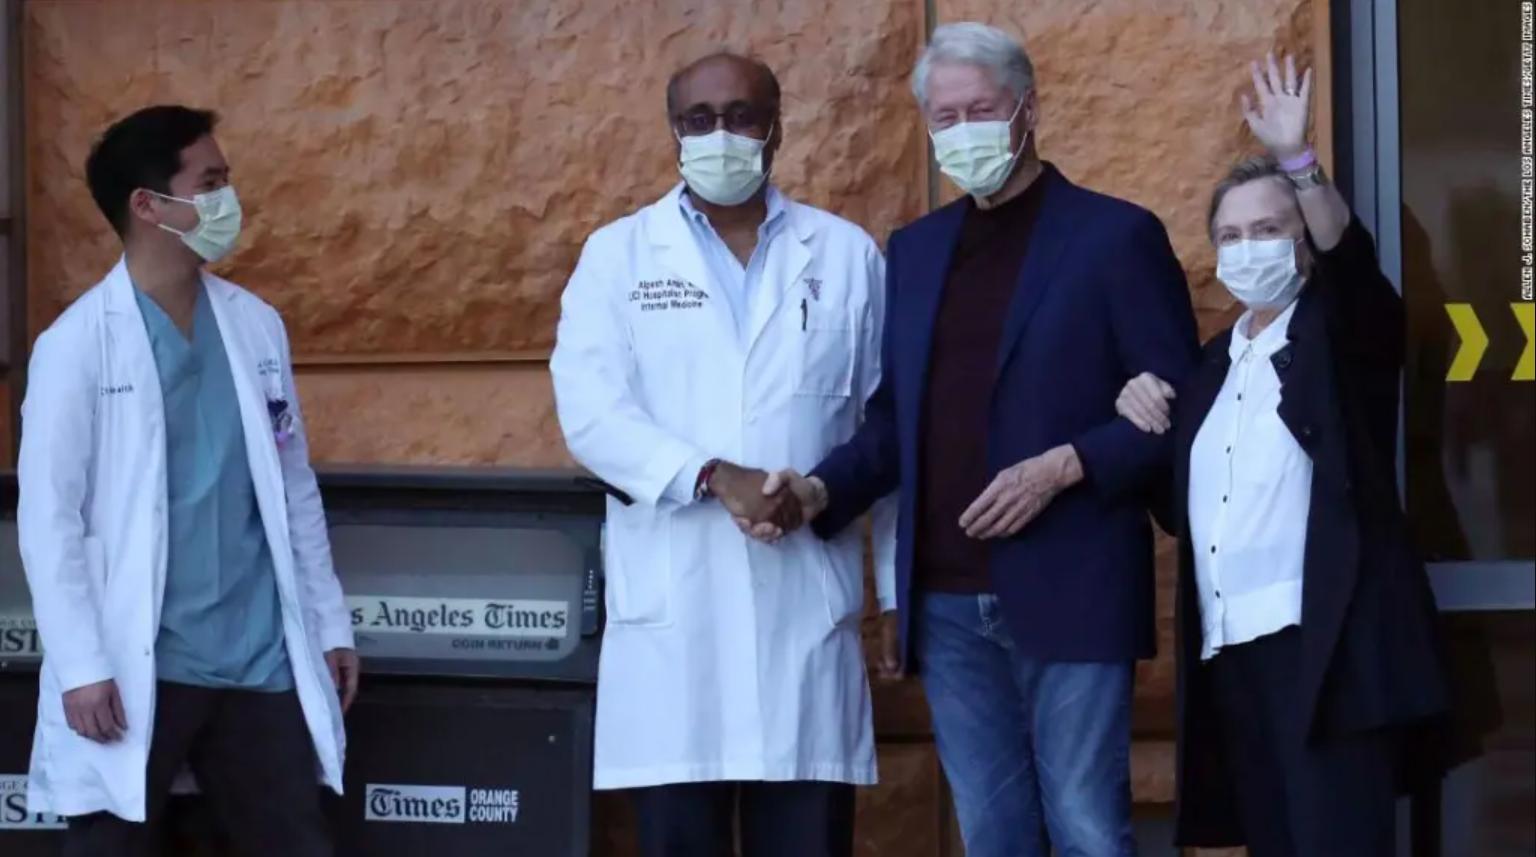 dan de alta al expresidente bill clinton luego de pasar cinco dias en un hospital de california debido a una infeccion